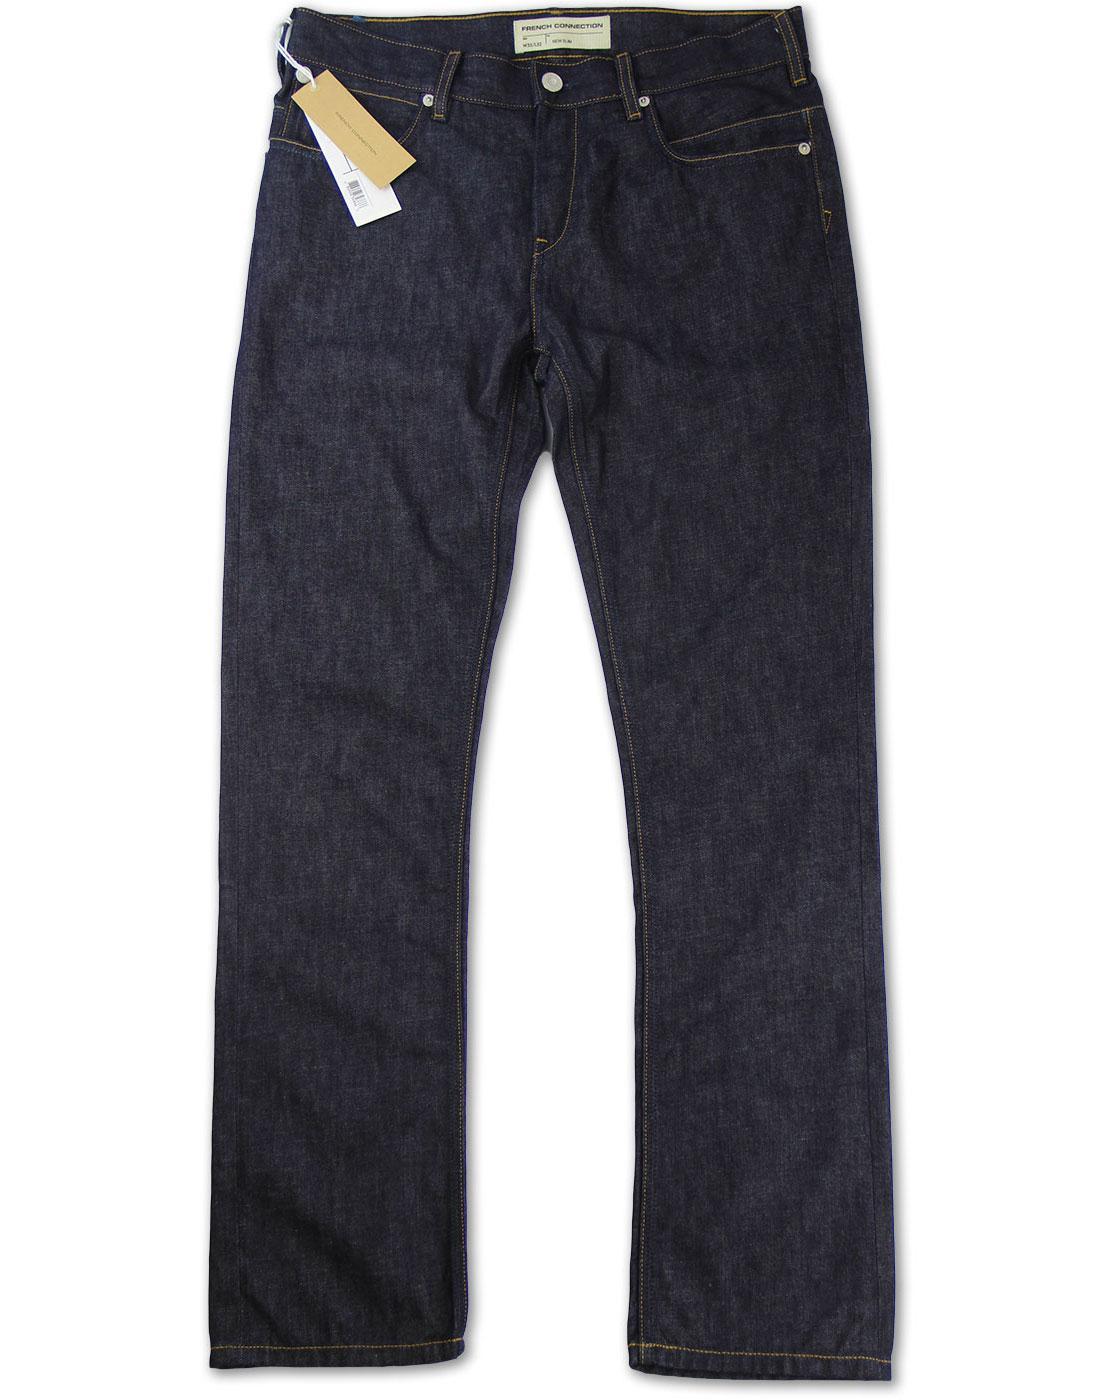 Destroyer Denim FRENCH CONNECTION Retro Slim Jeans